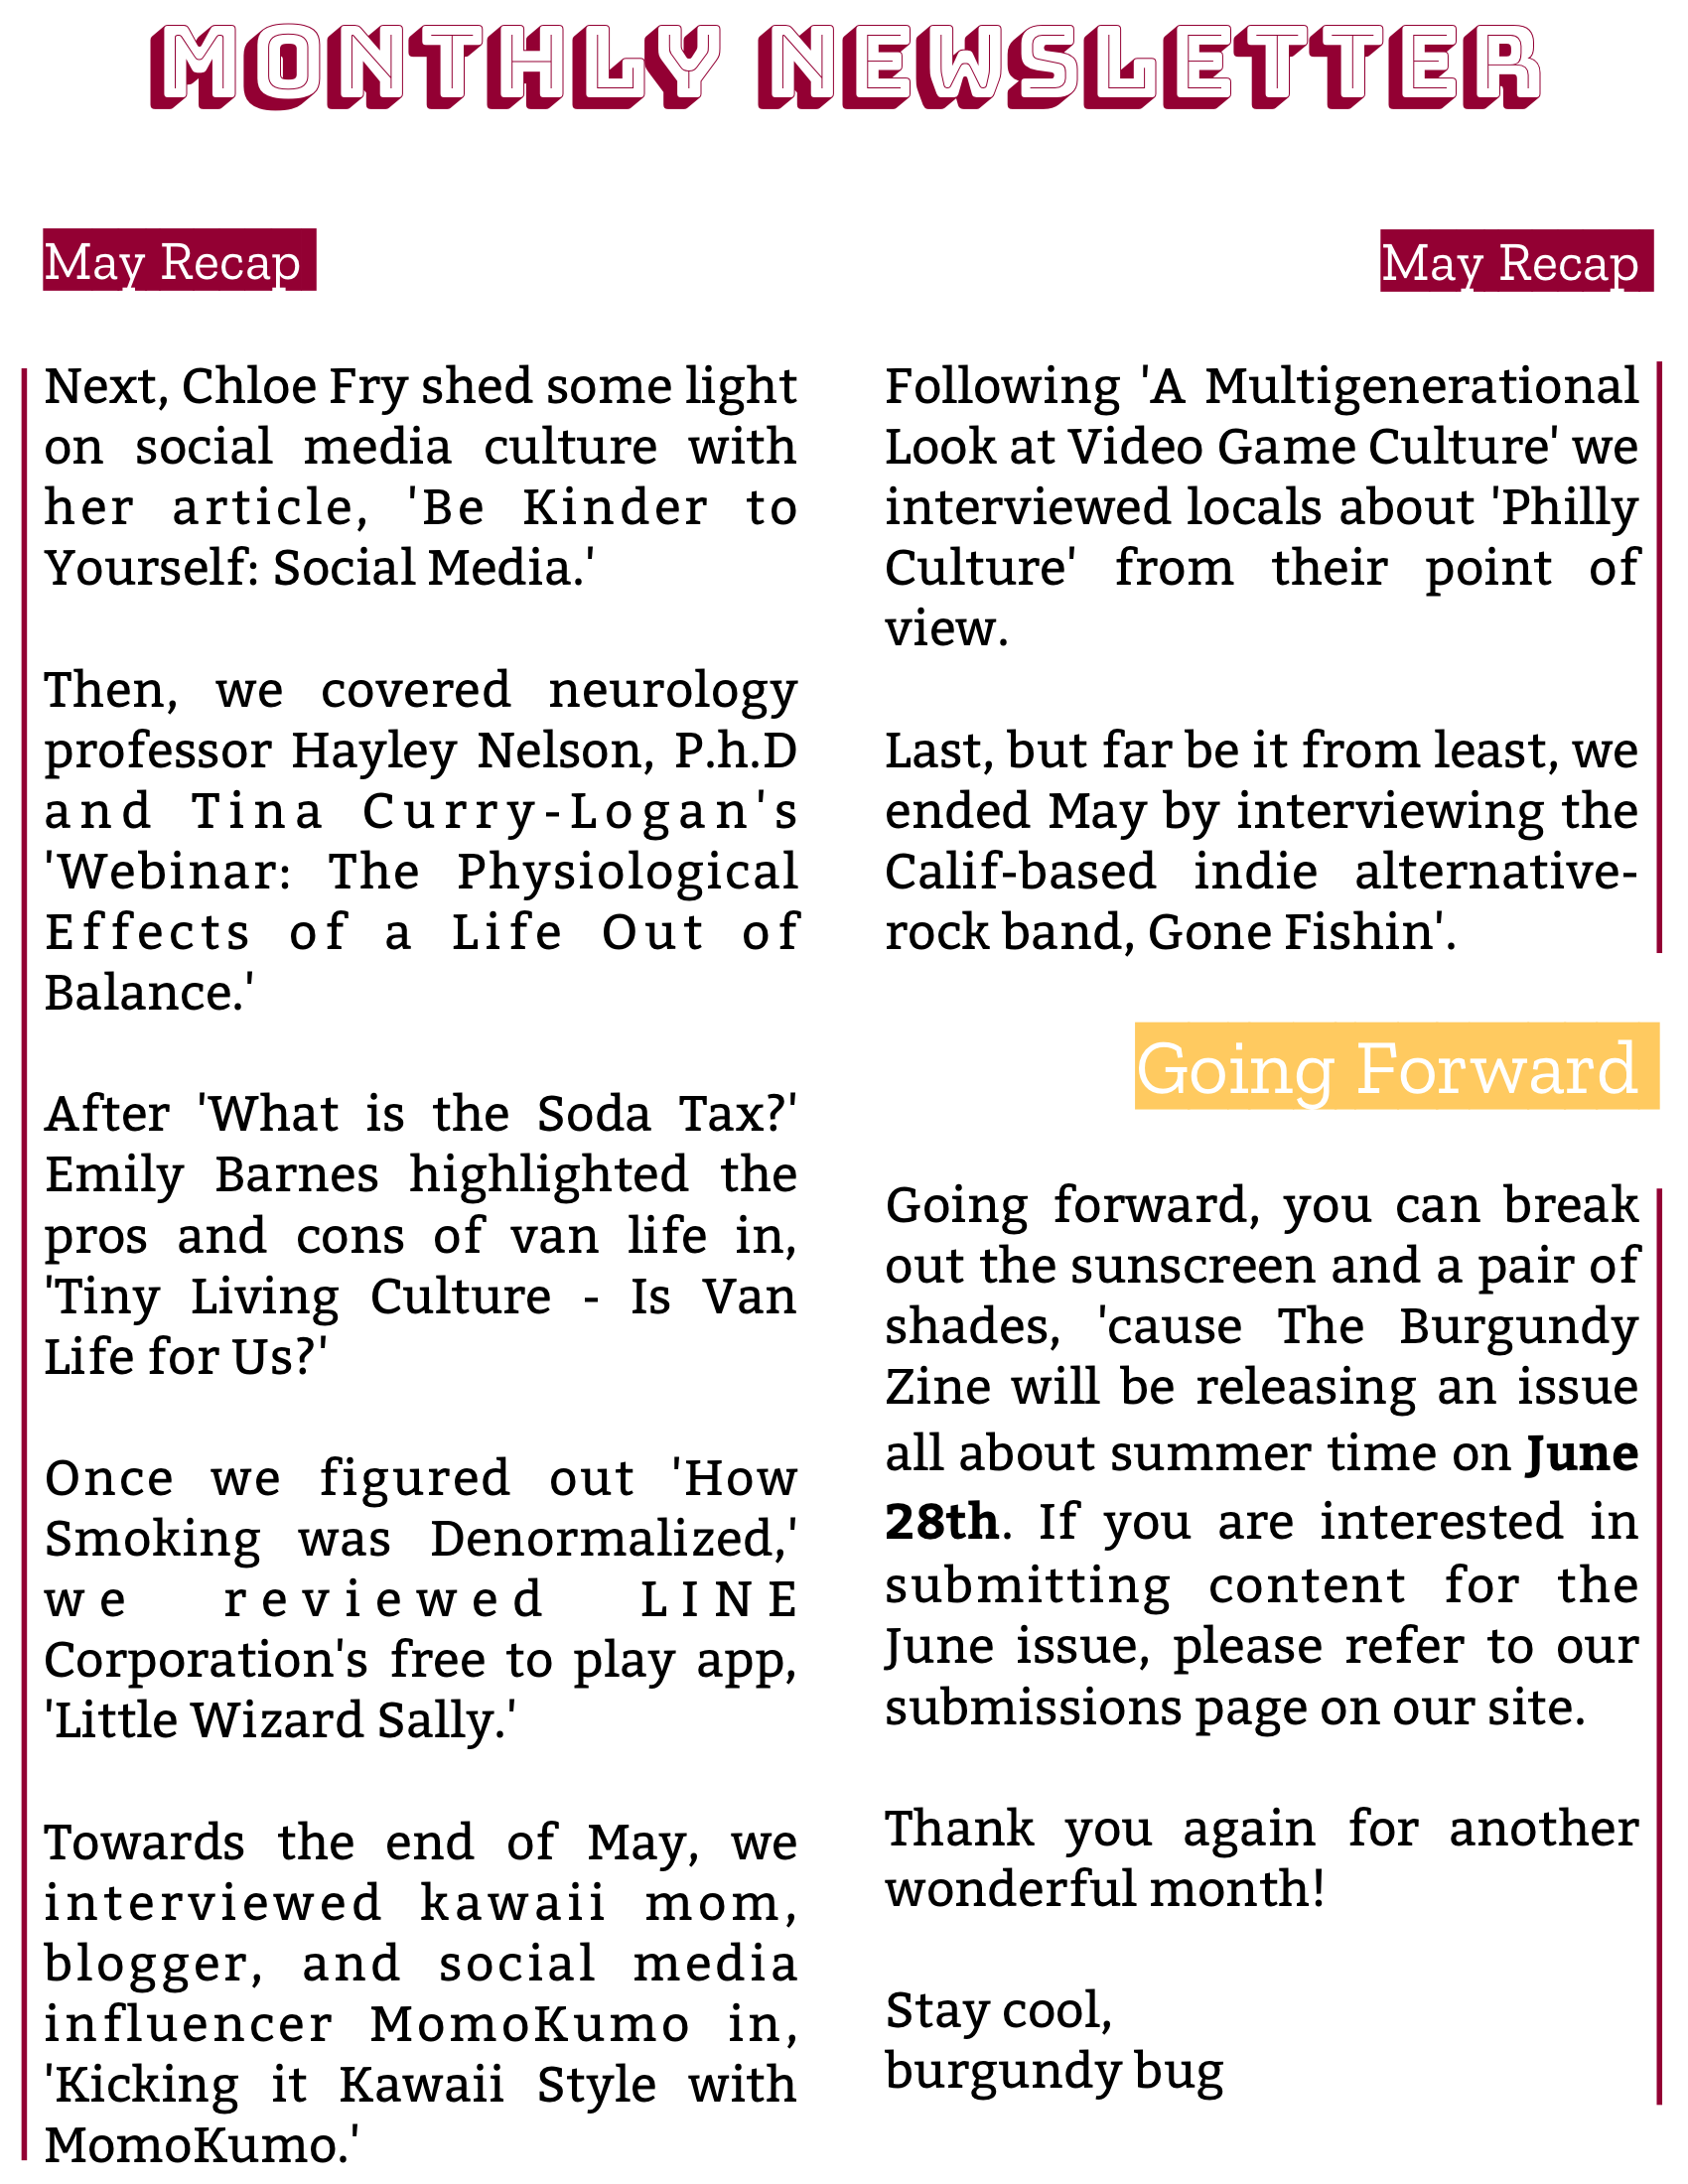 The Burgundy Zine #5: Culture Pg. 142